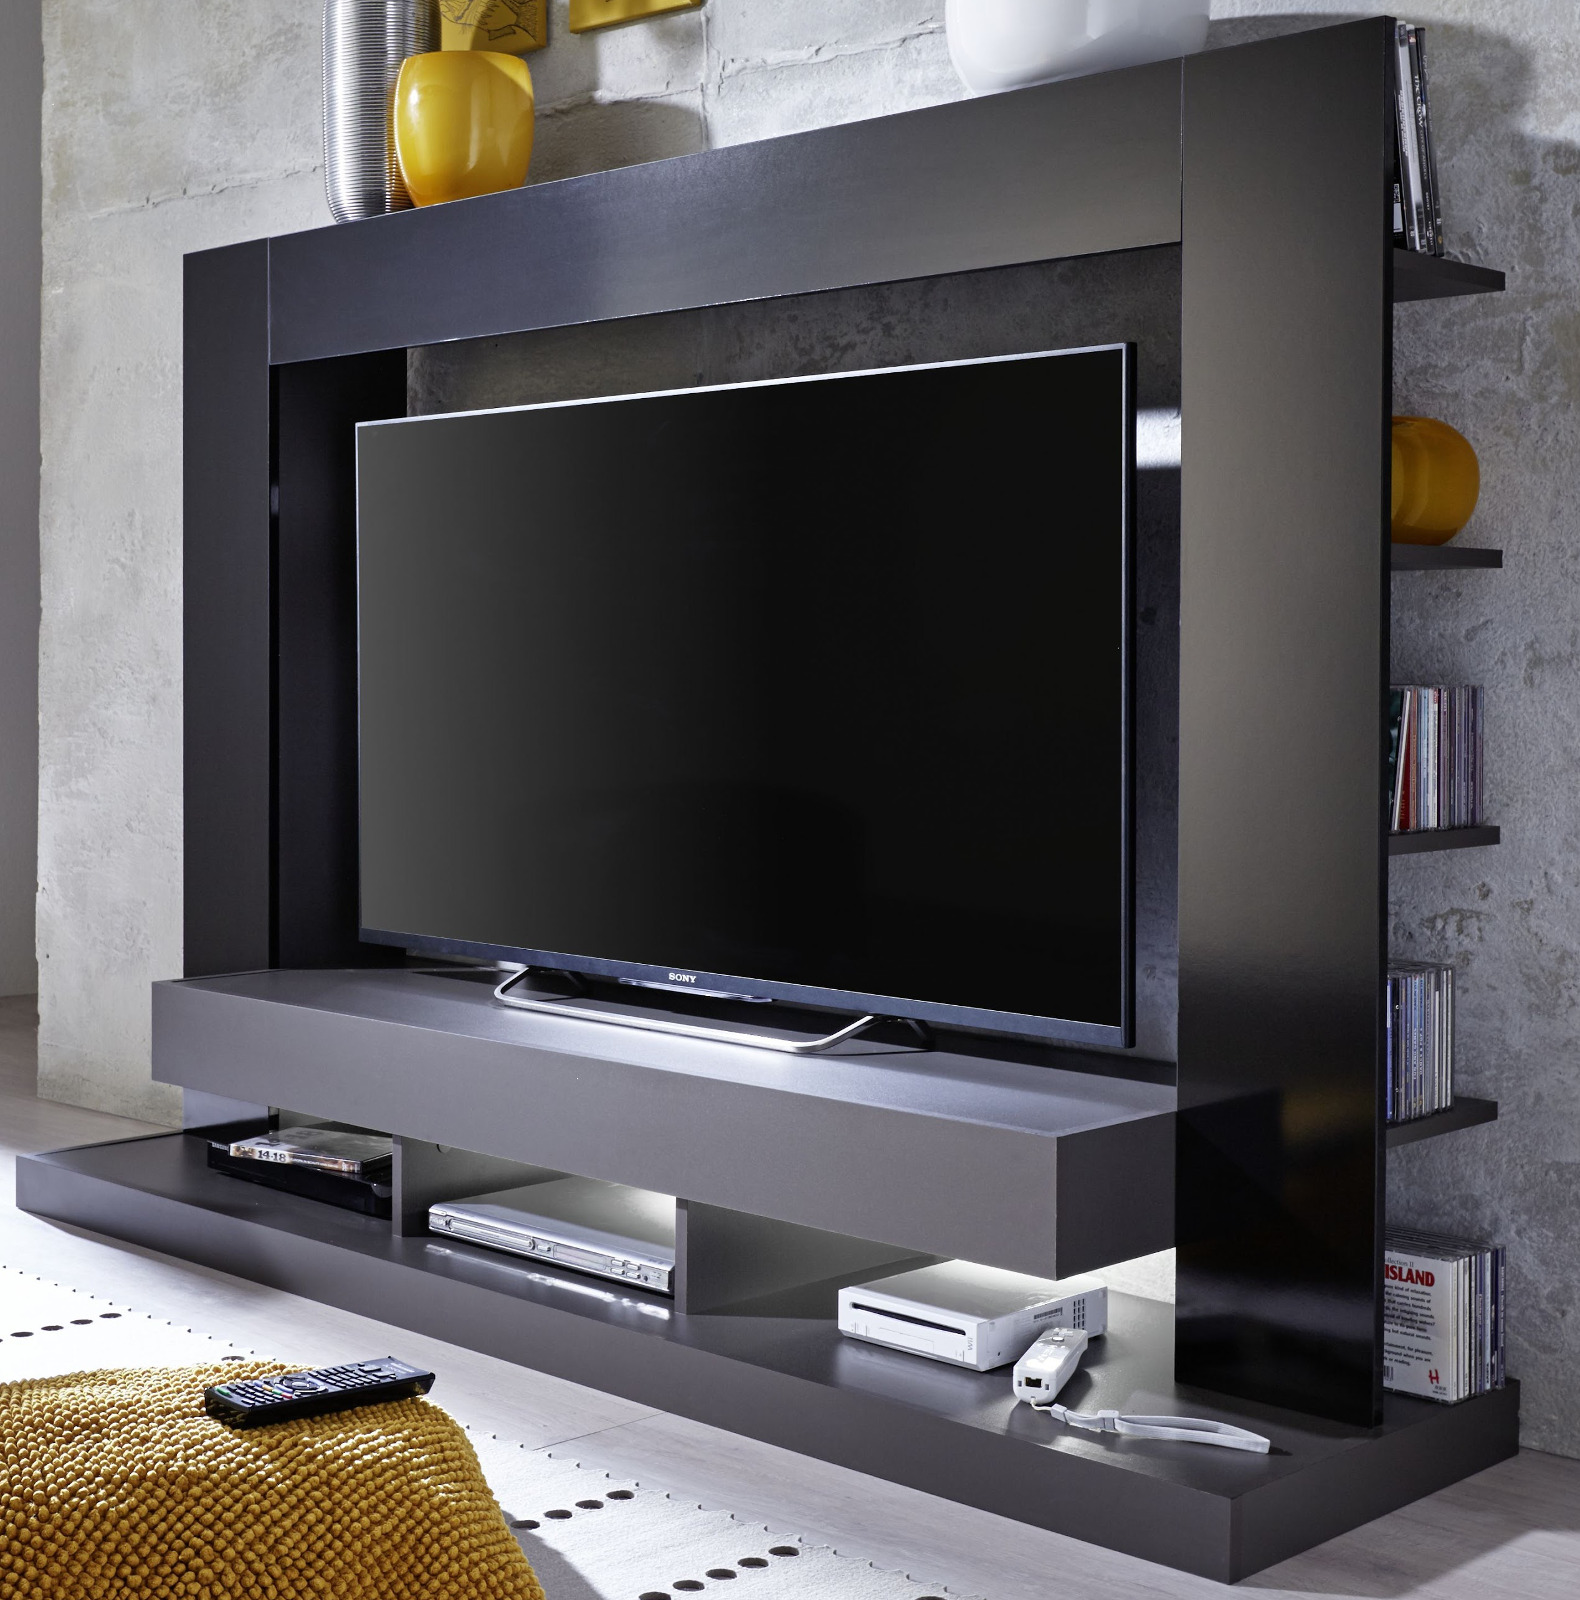 mediawand cyneplex schwarz grau gl nzend. Black Bedroom Furniture Sets. Home Design Ideas